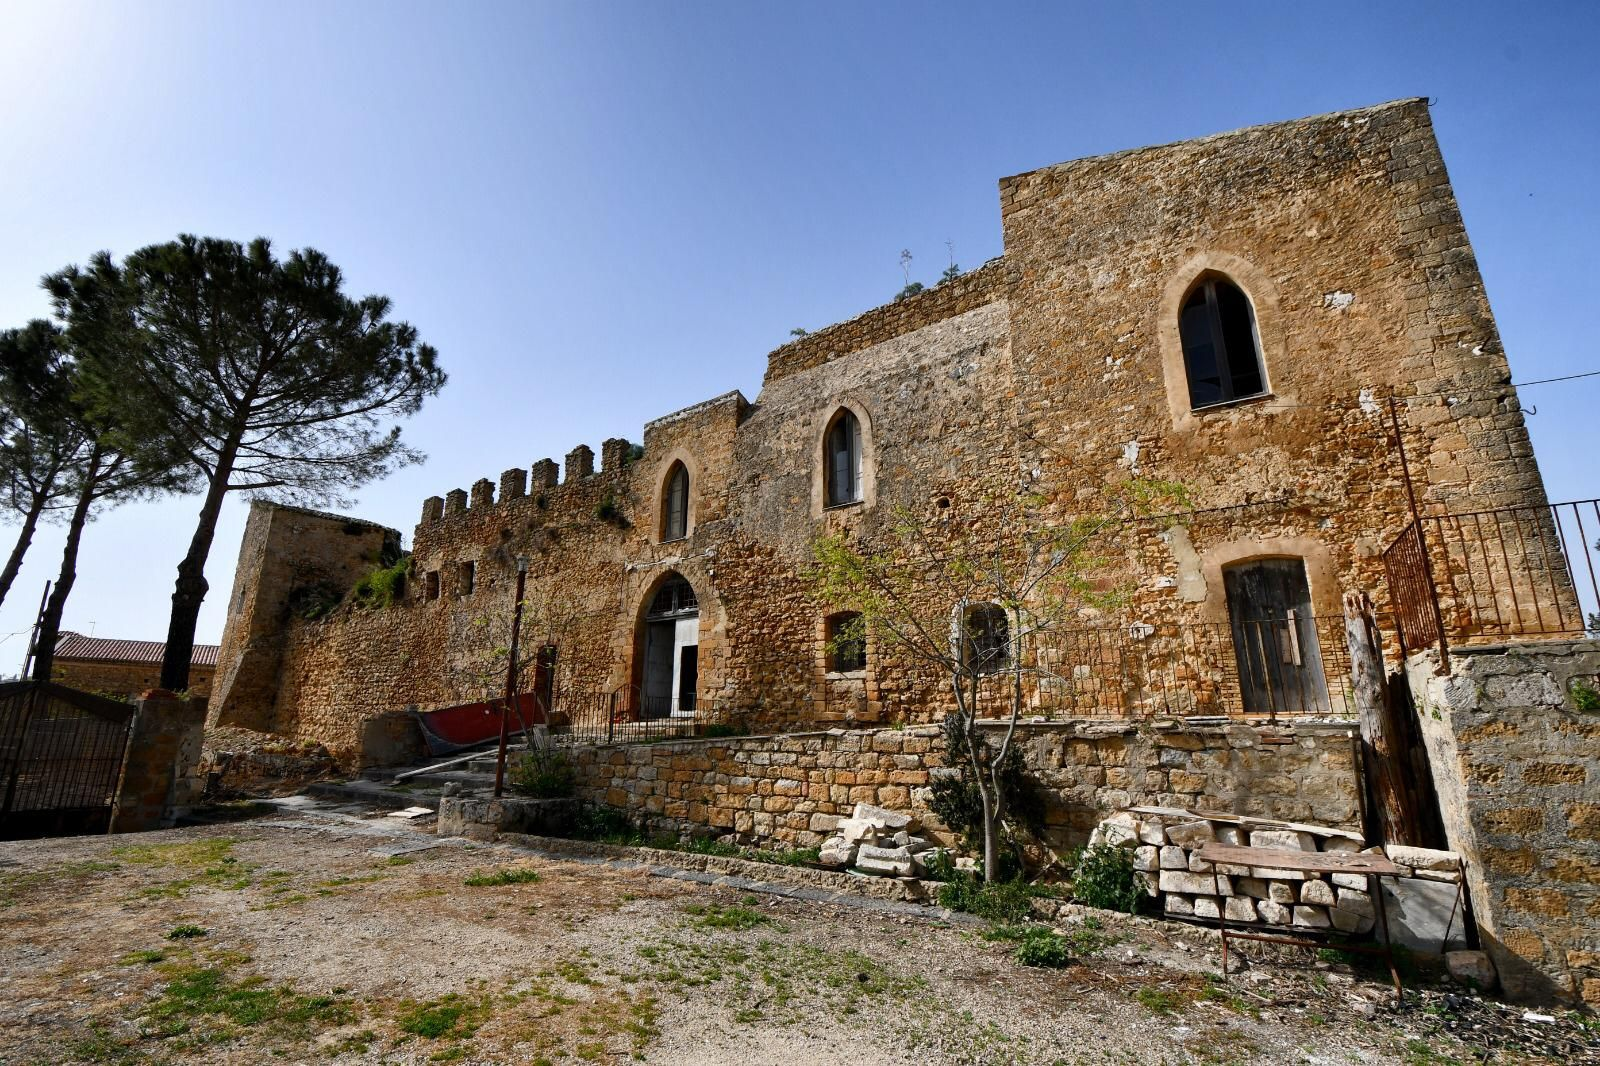 Piazza Armerina, Castello Aragonese